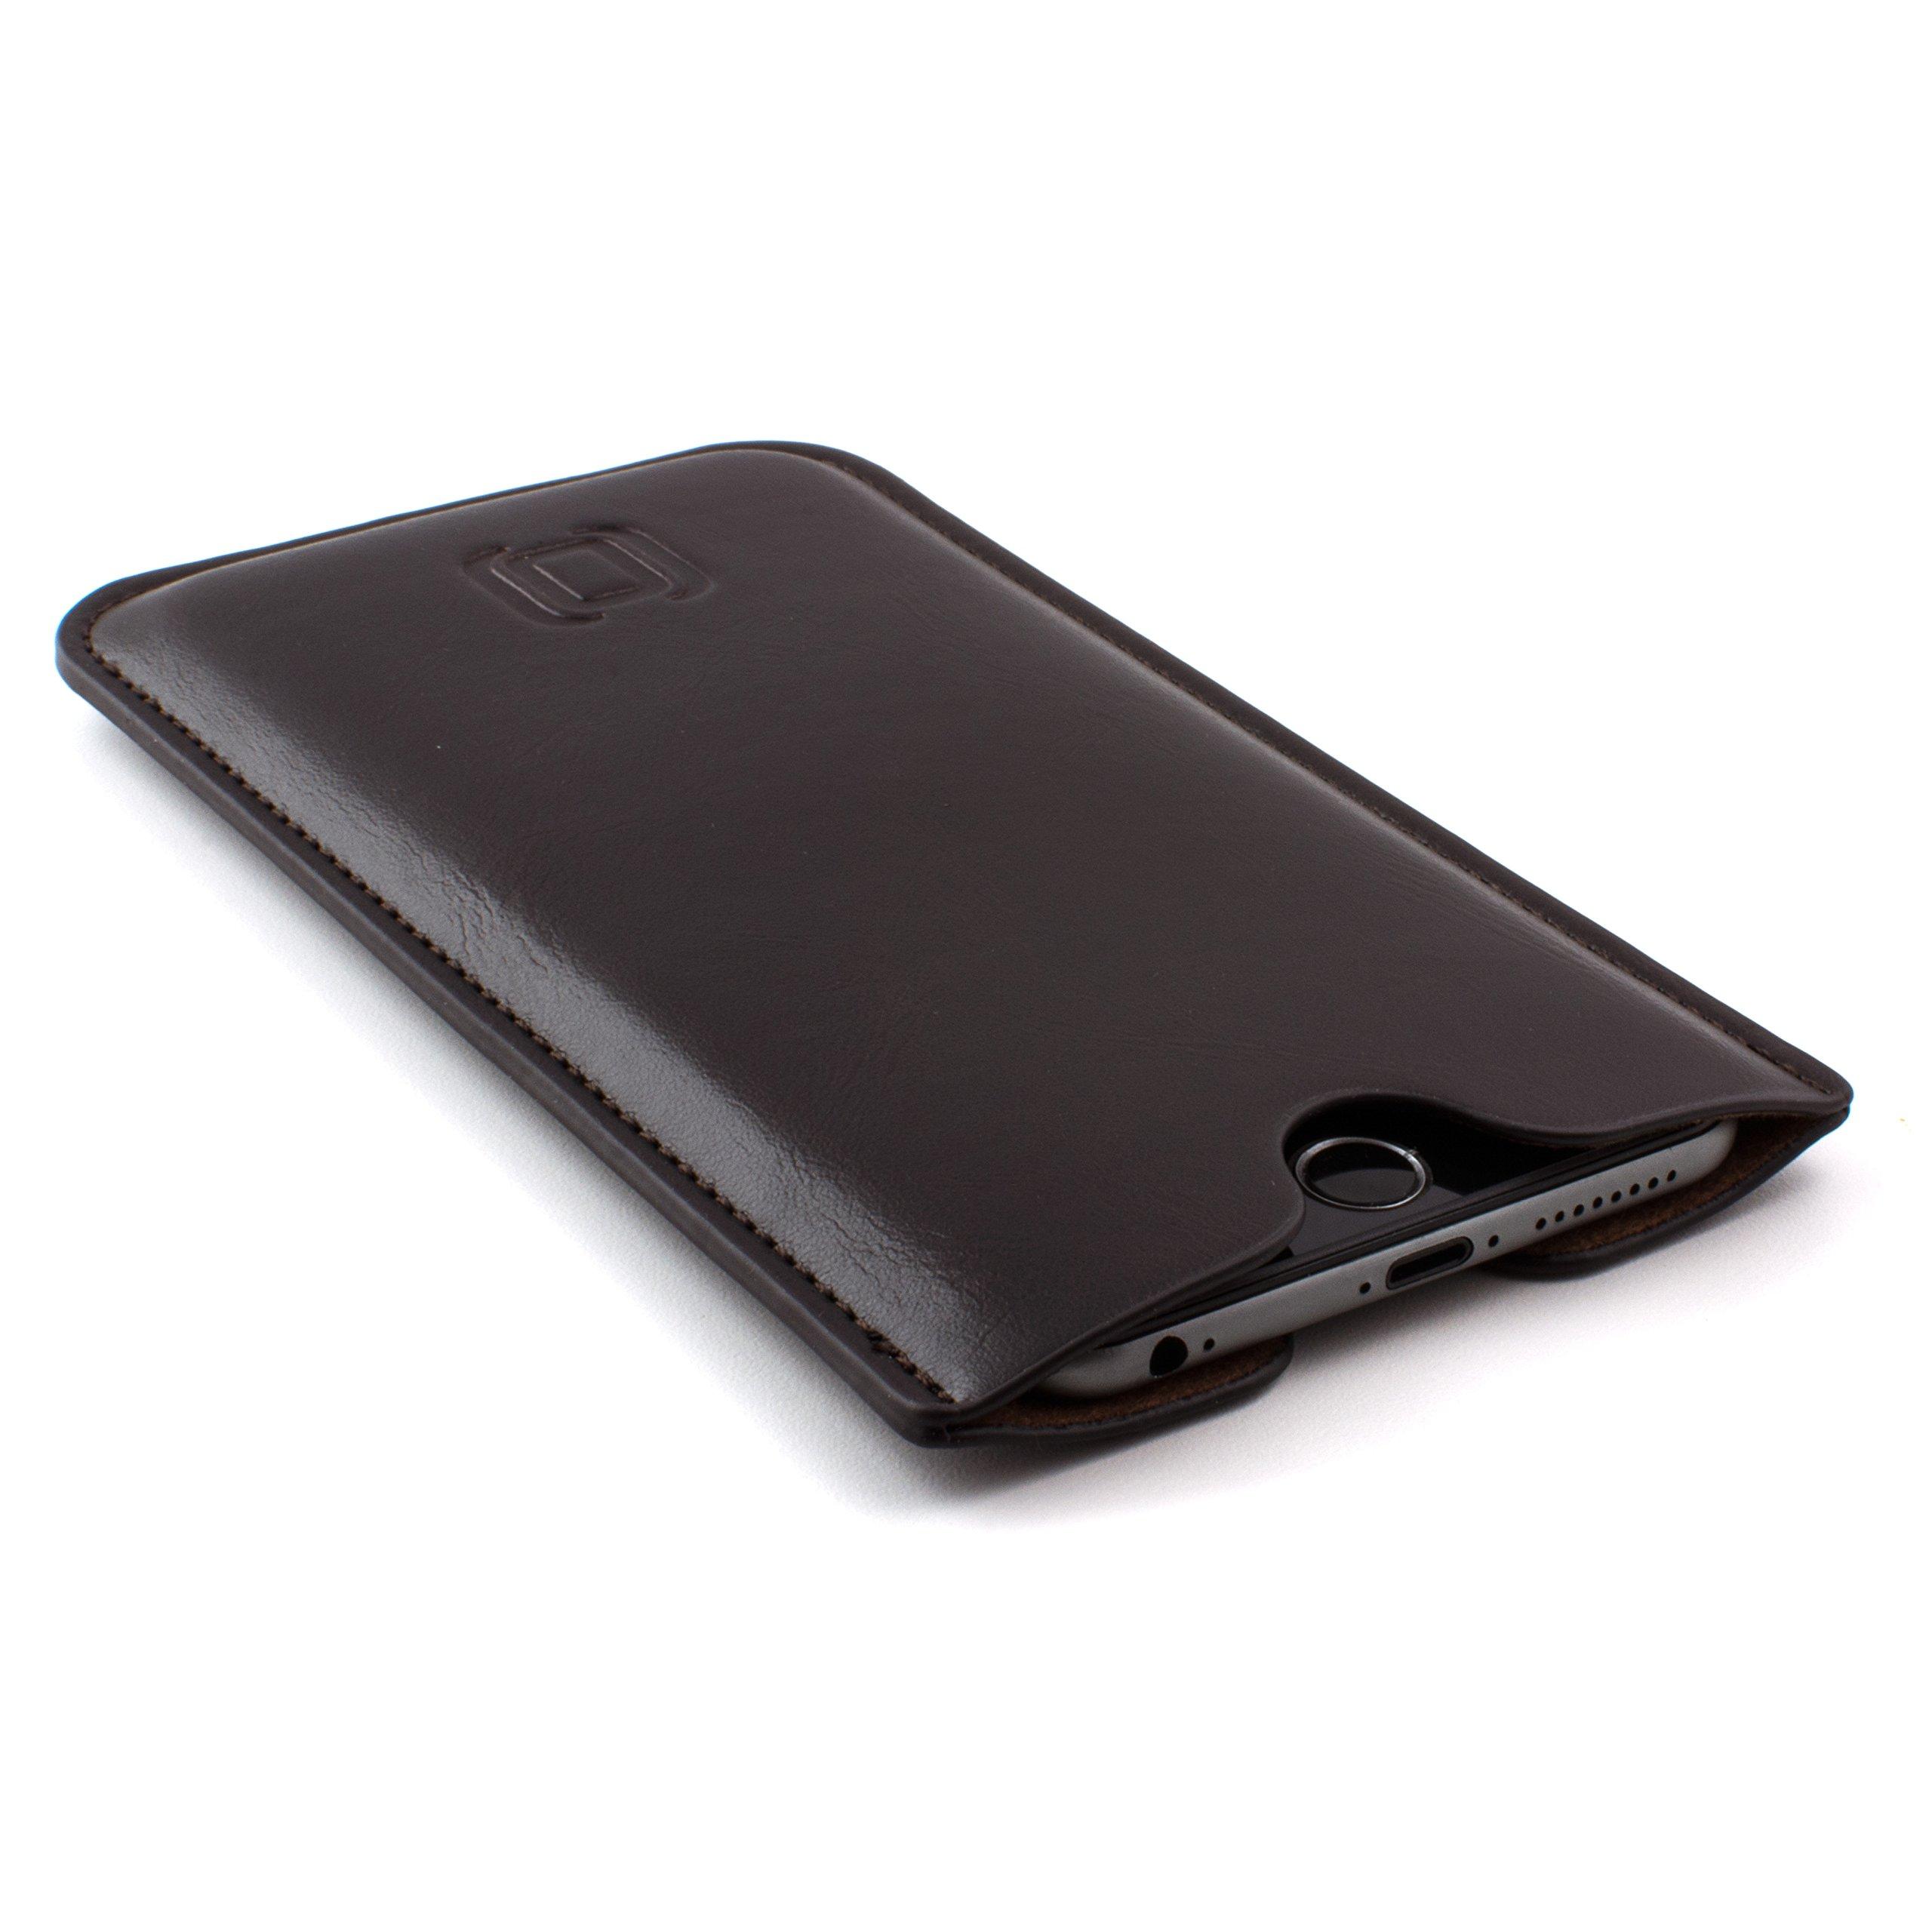 Dockem Executive Sleeve for iPhone 8 Plus, 7 Plus, 6+ & 6S+; Slightly Padded Premium Synthetic/Vegan Leather with Microfiber Lining, Slim, Simple, Slip-on Case [Dark Brown]